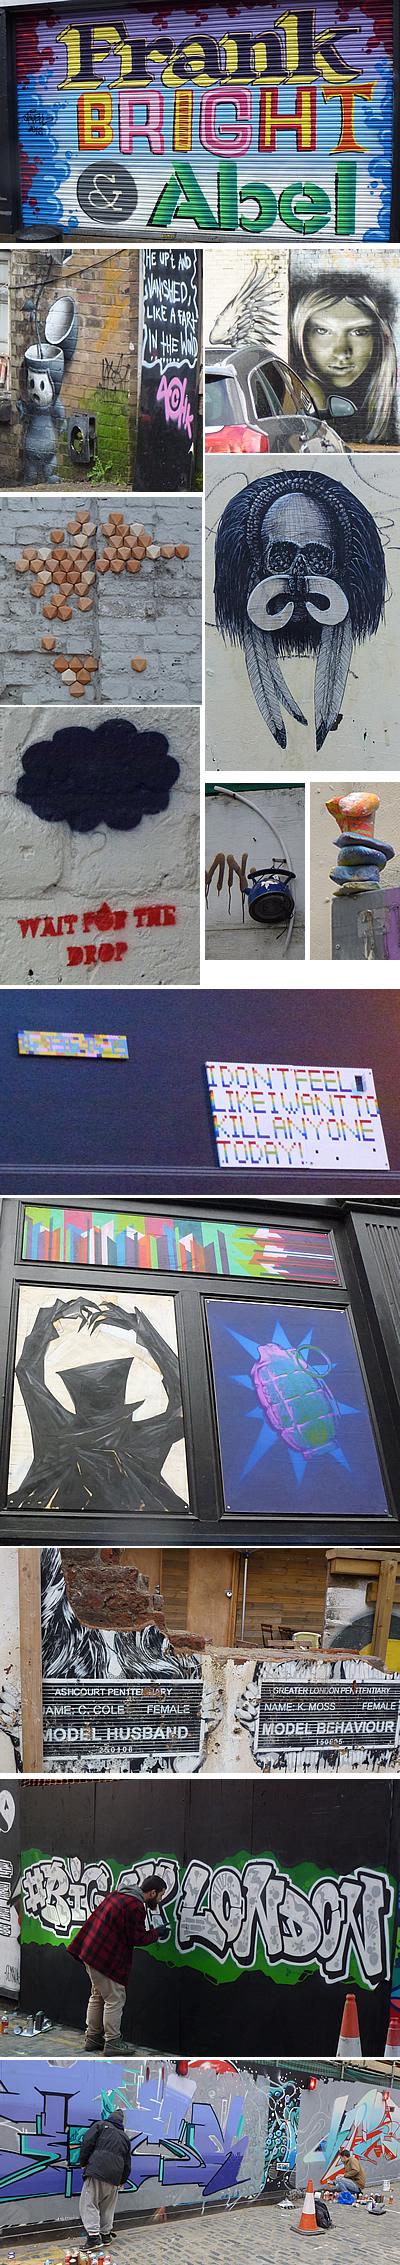 various-streetart-2013.jpg